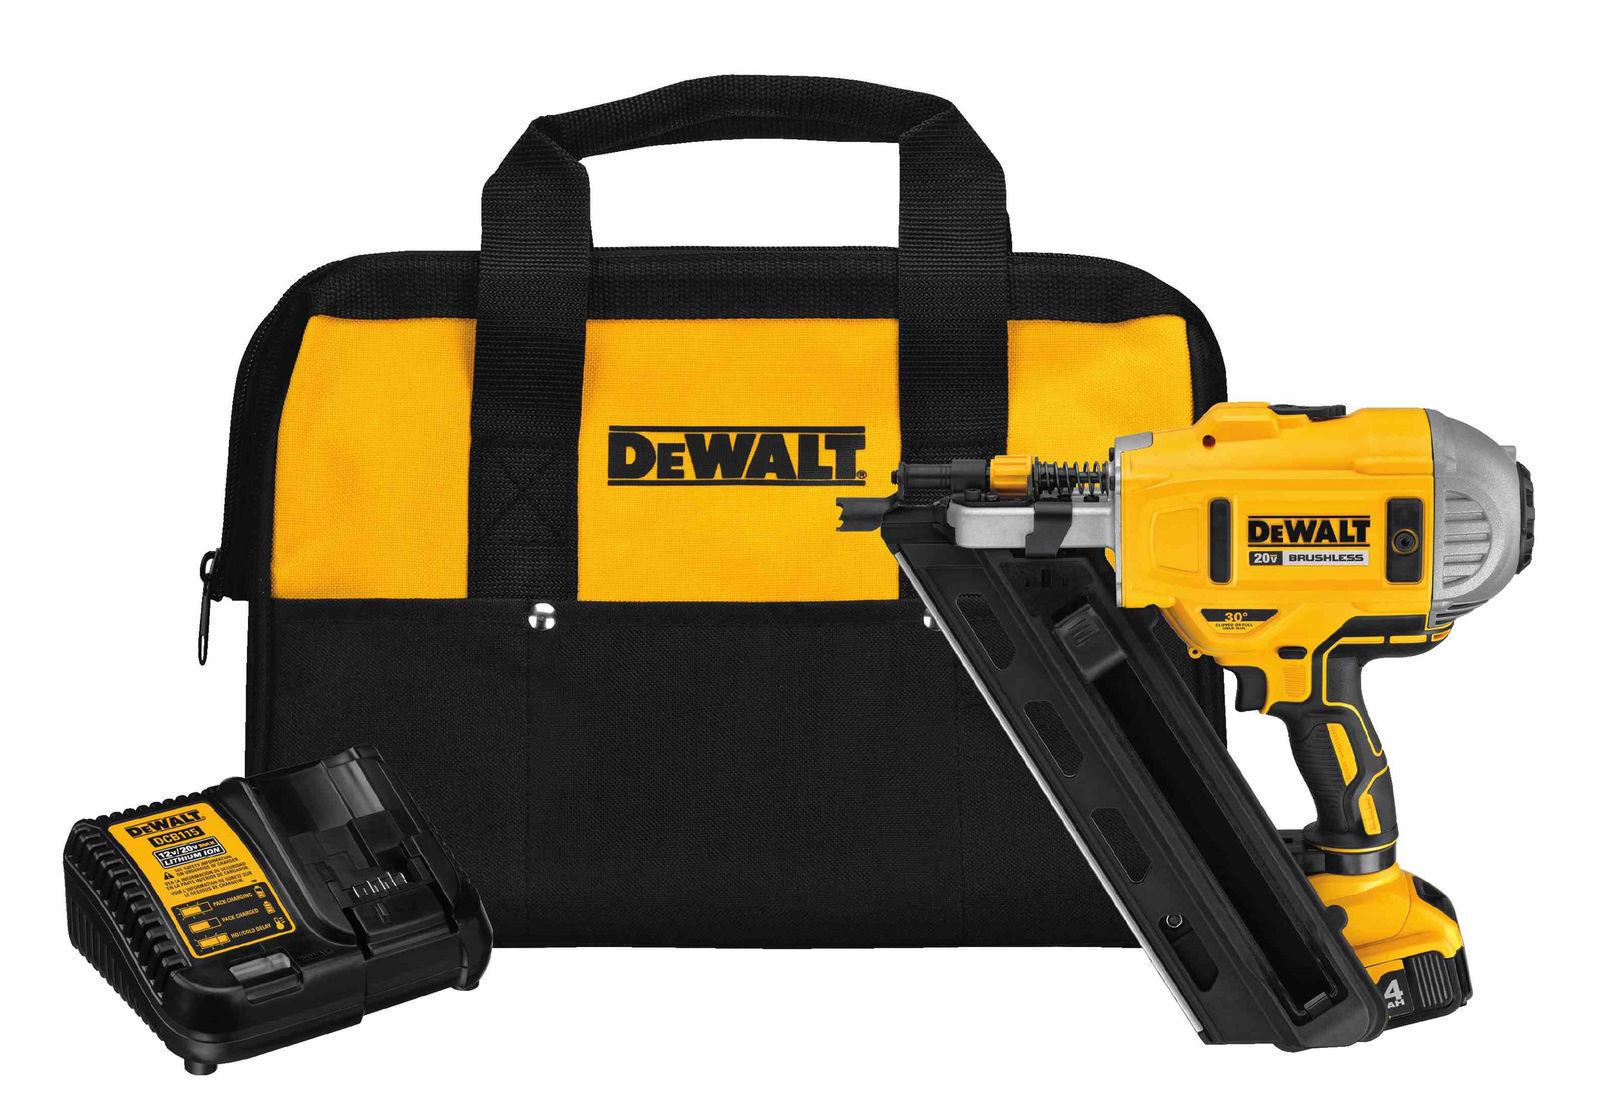 DEWALT DCN692M1 20V Cordless Nailer Kit | eBay